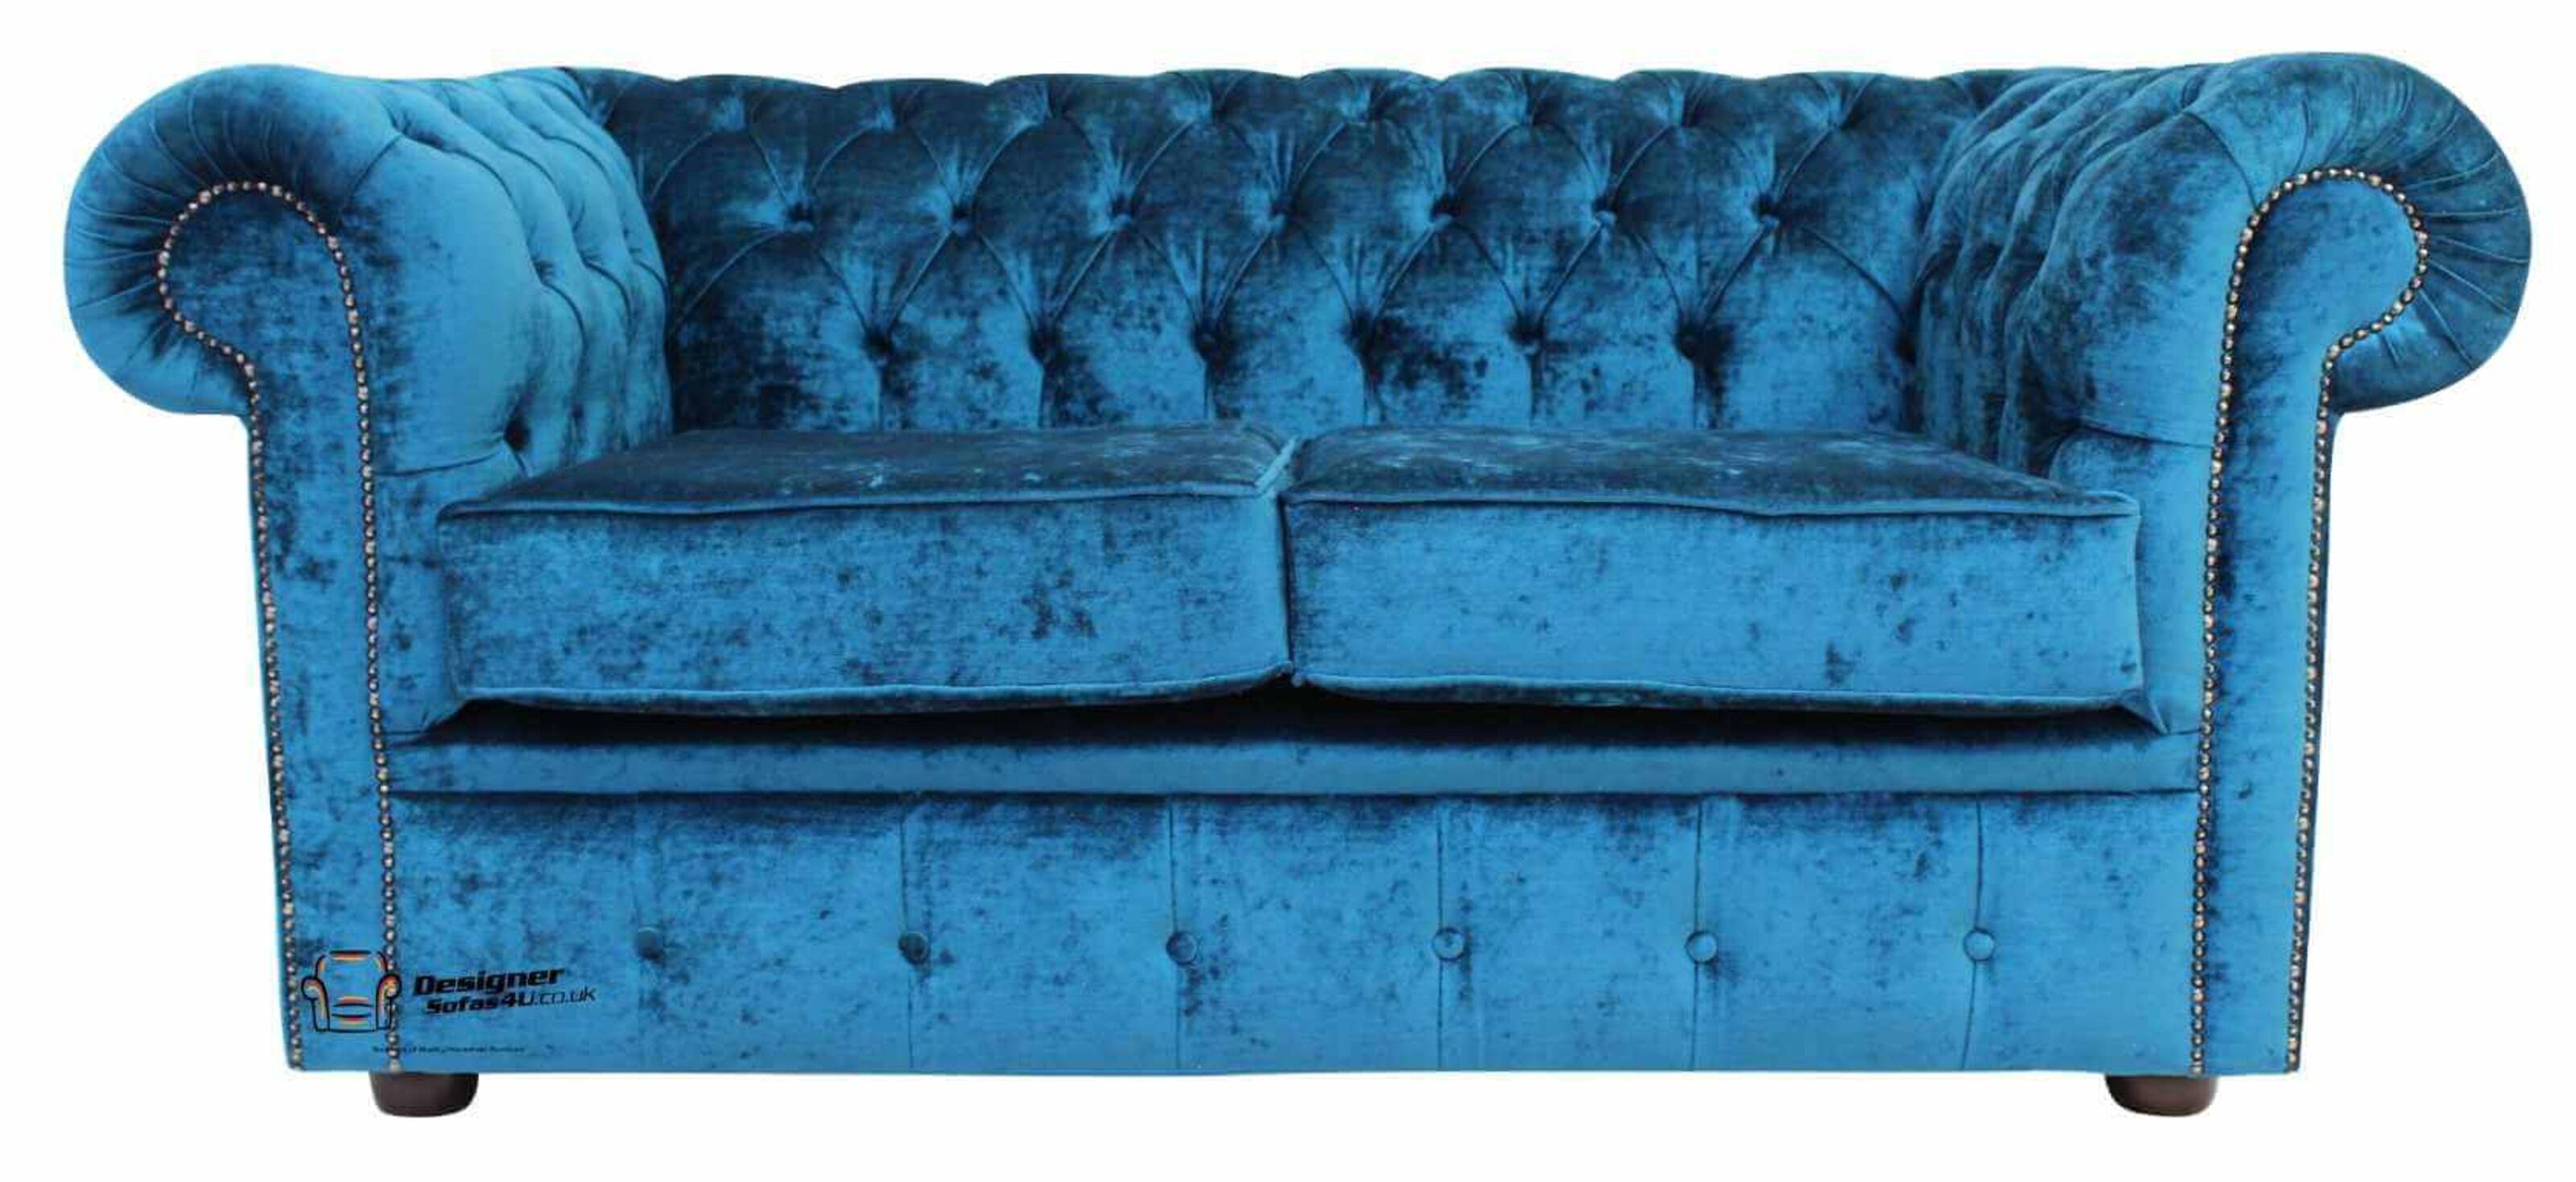 6811b01a3465 ... Offer · Chesterfield 2 Seater Sofa Settee Pastiche Petrol Blue Velvet  ...